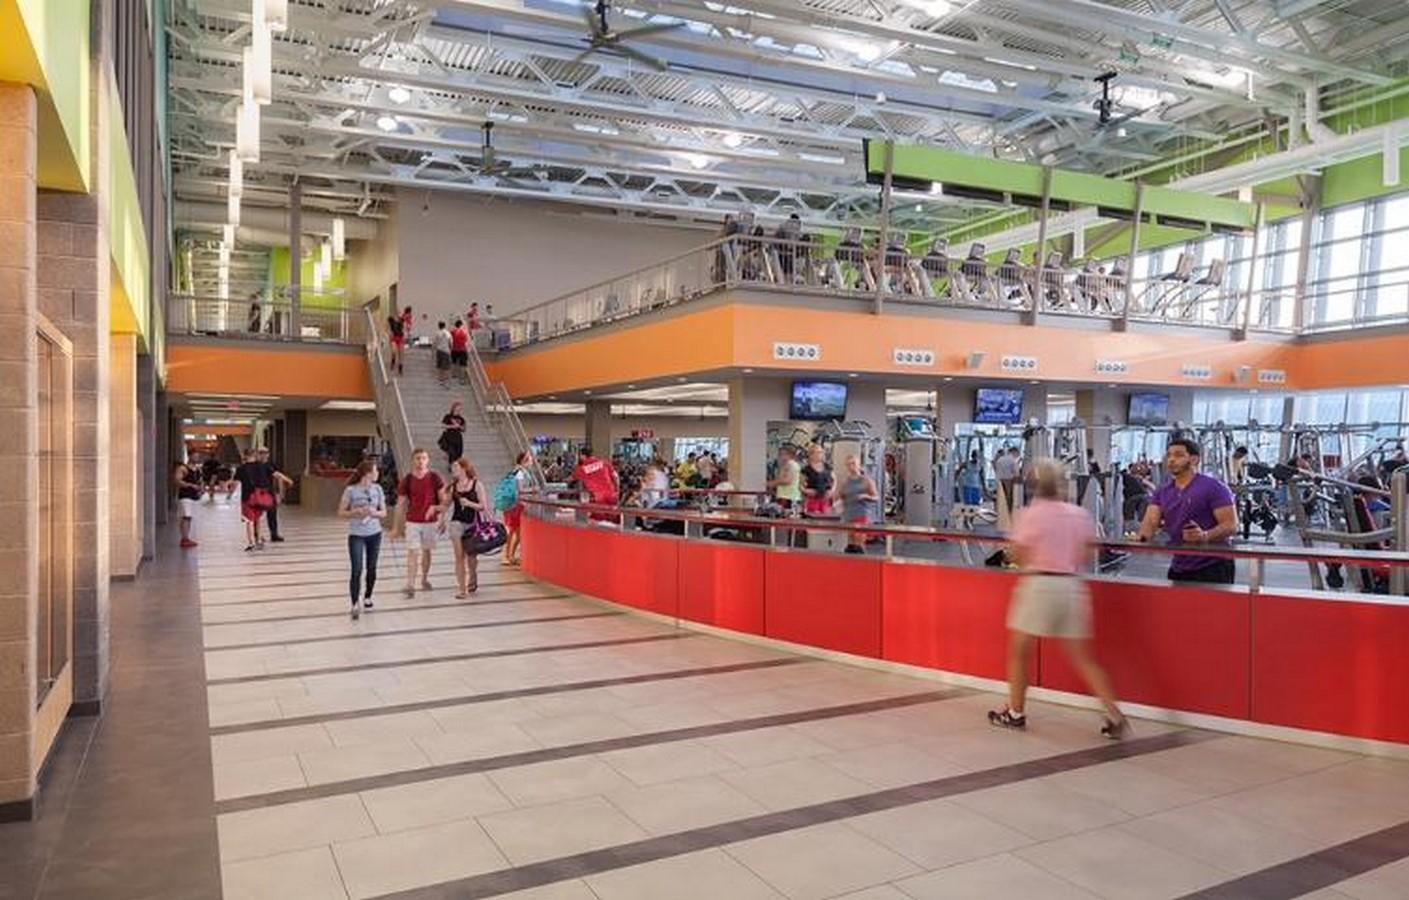 Student Life center-state University of New York (SUNY) Cortland- sheet3